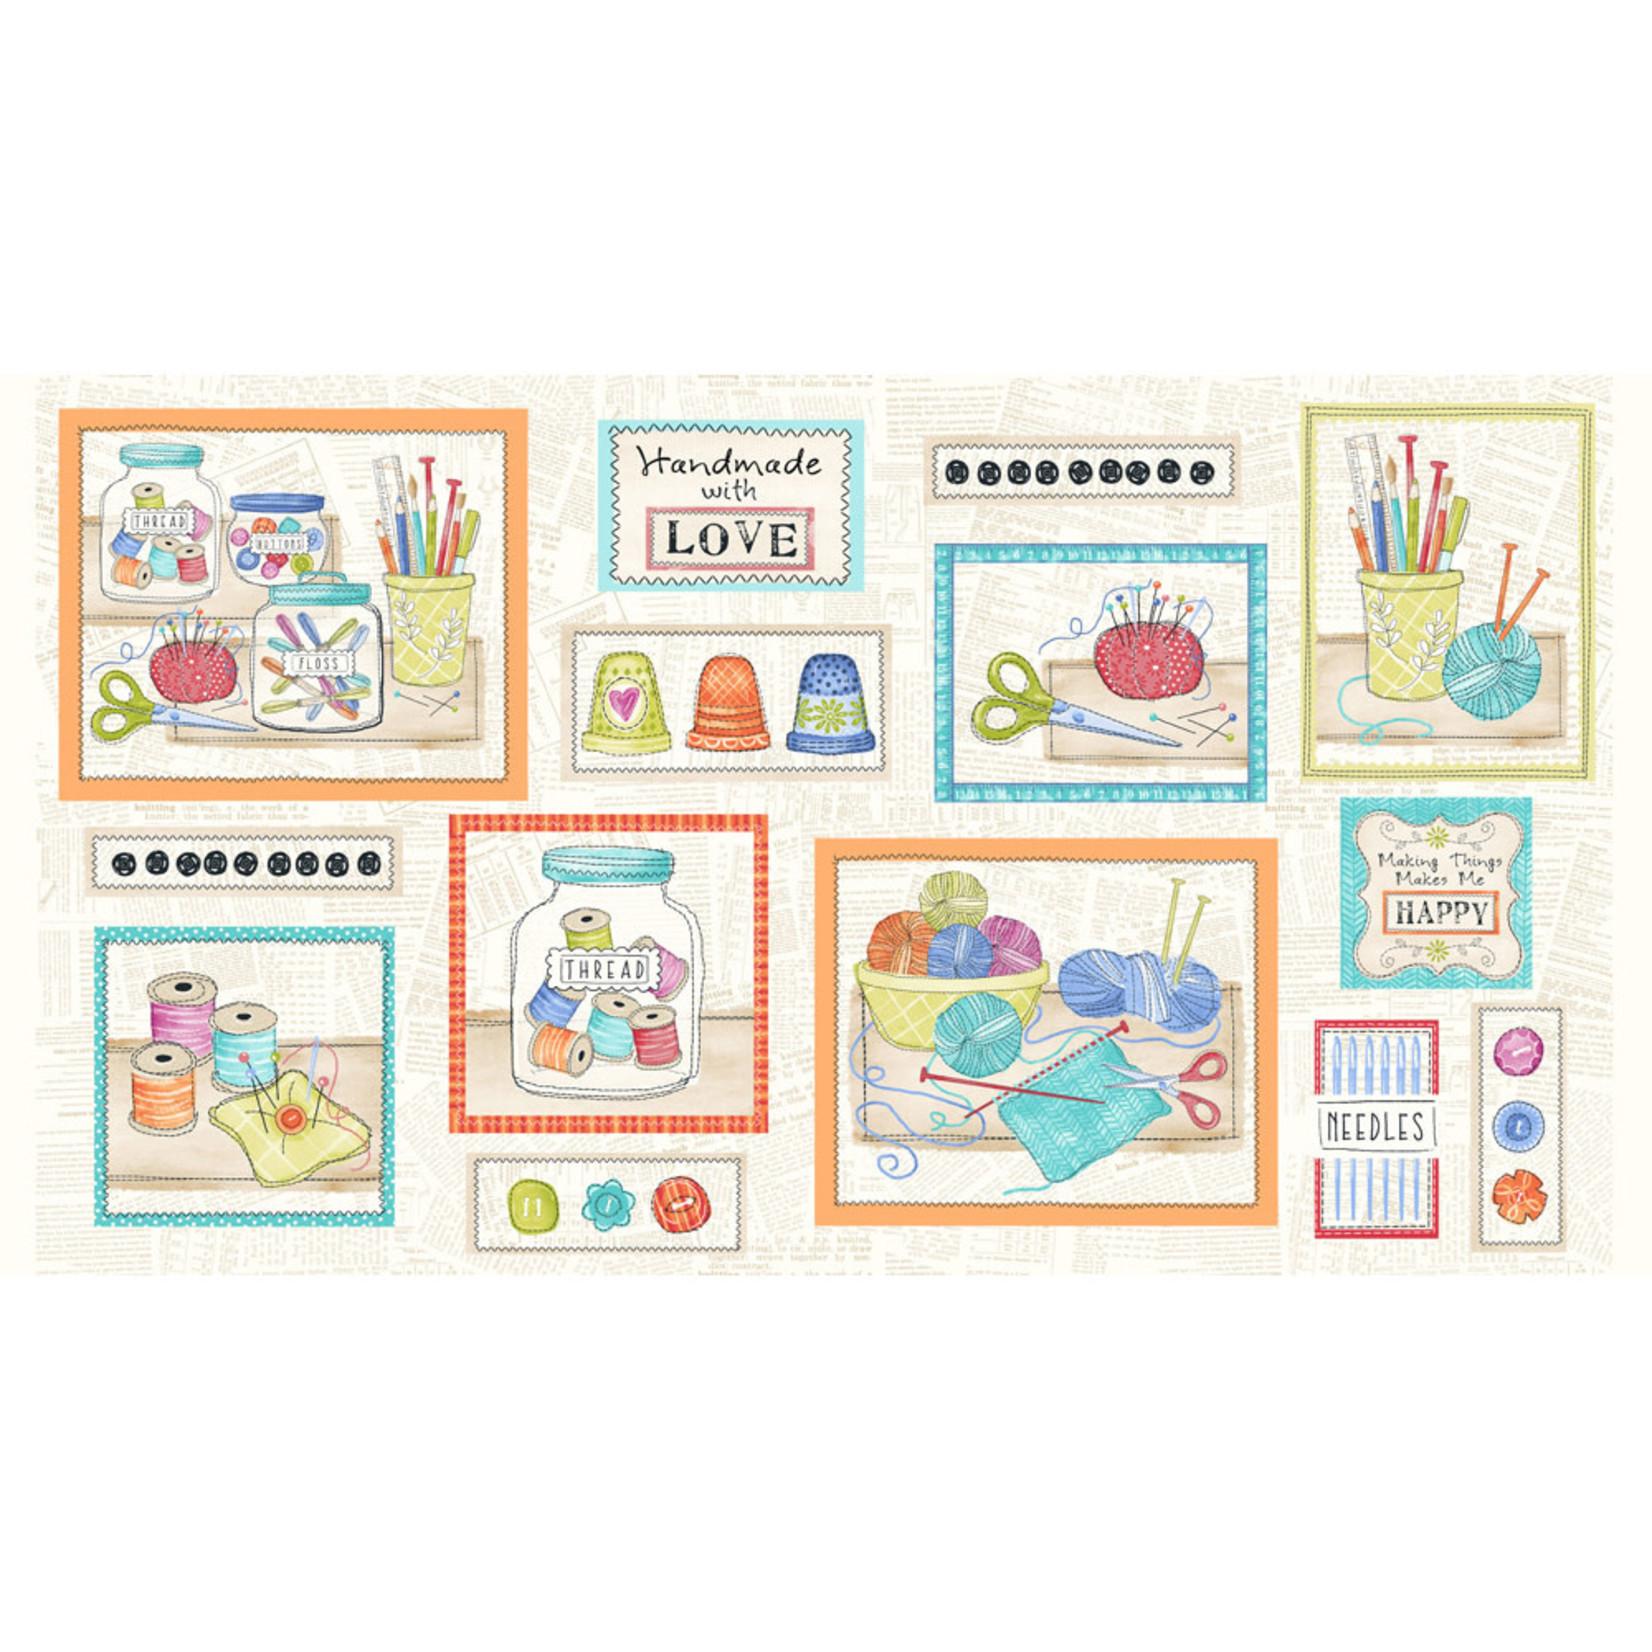 Stof Fabrics Handmade With love - Panel